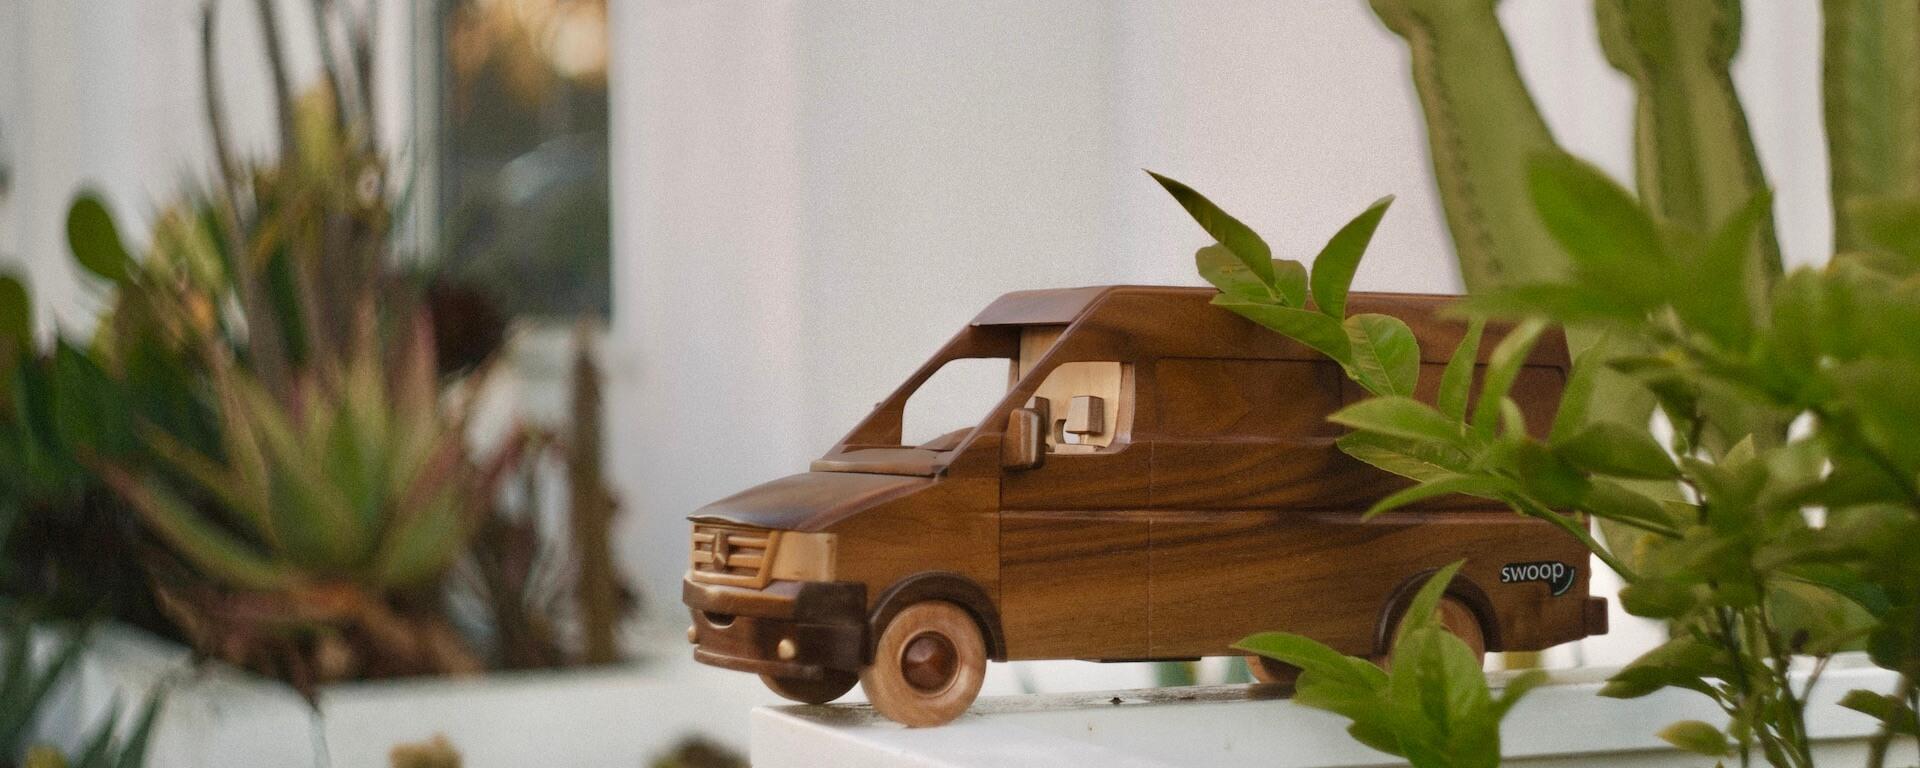 Wooden toy of swoop van in front of a plant